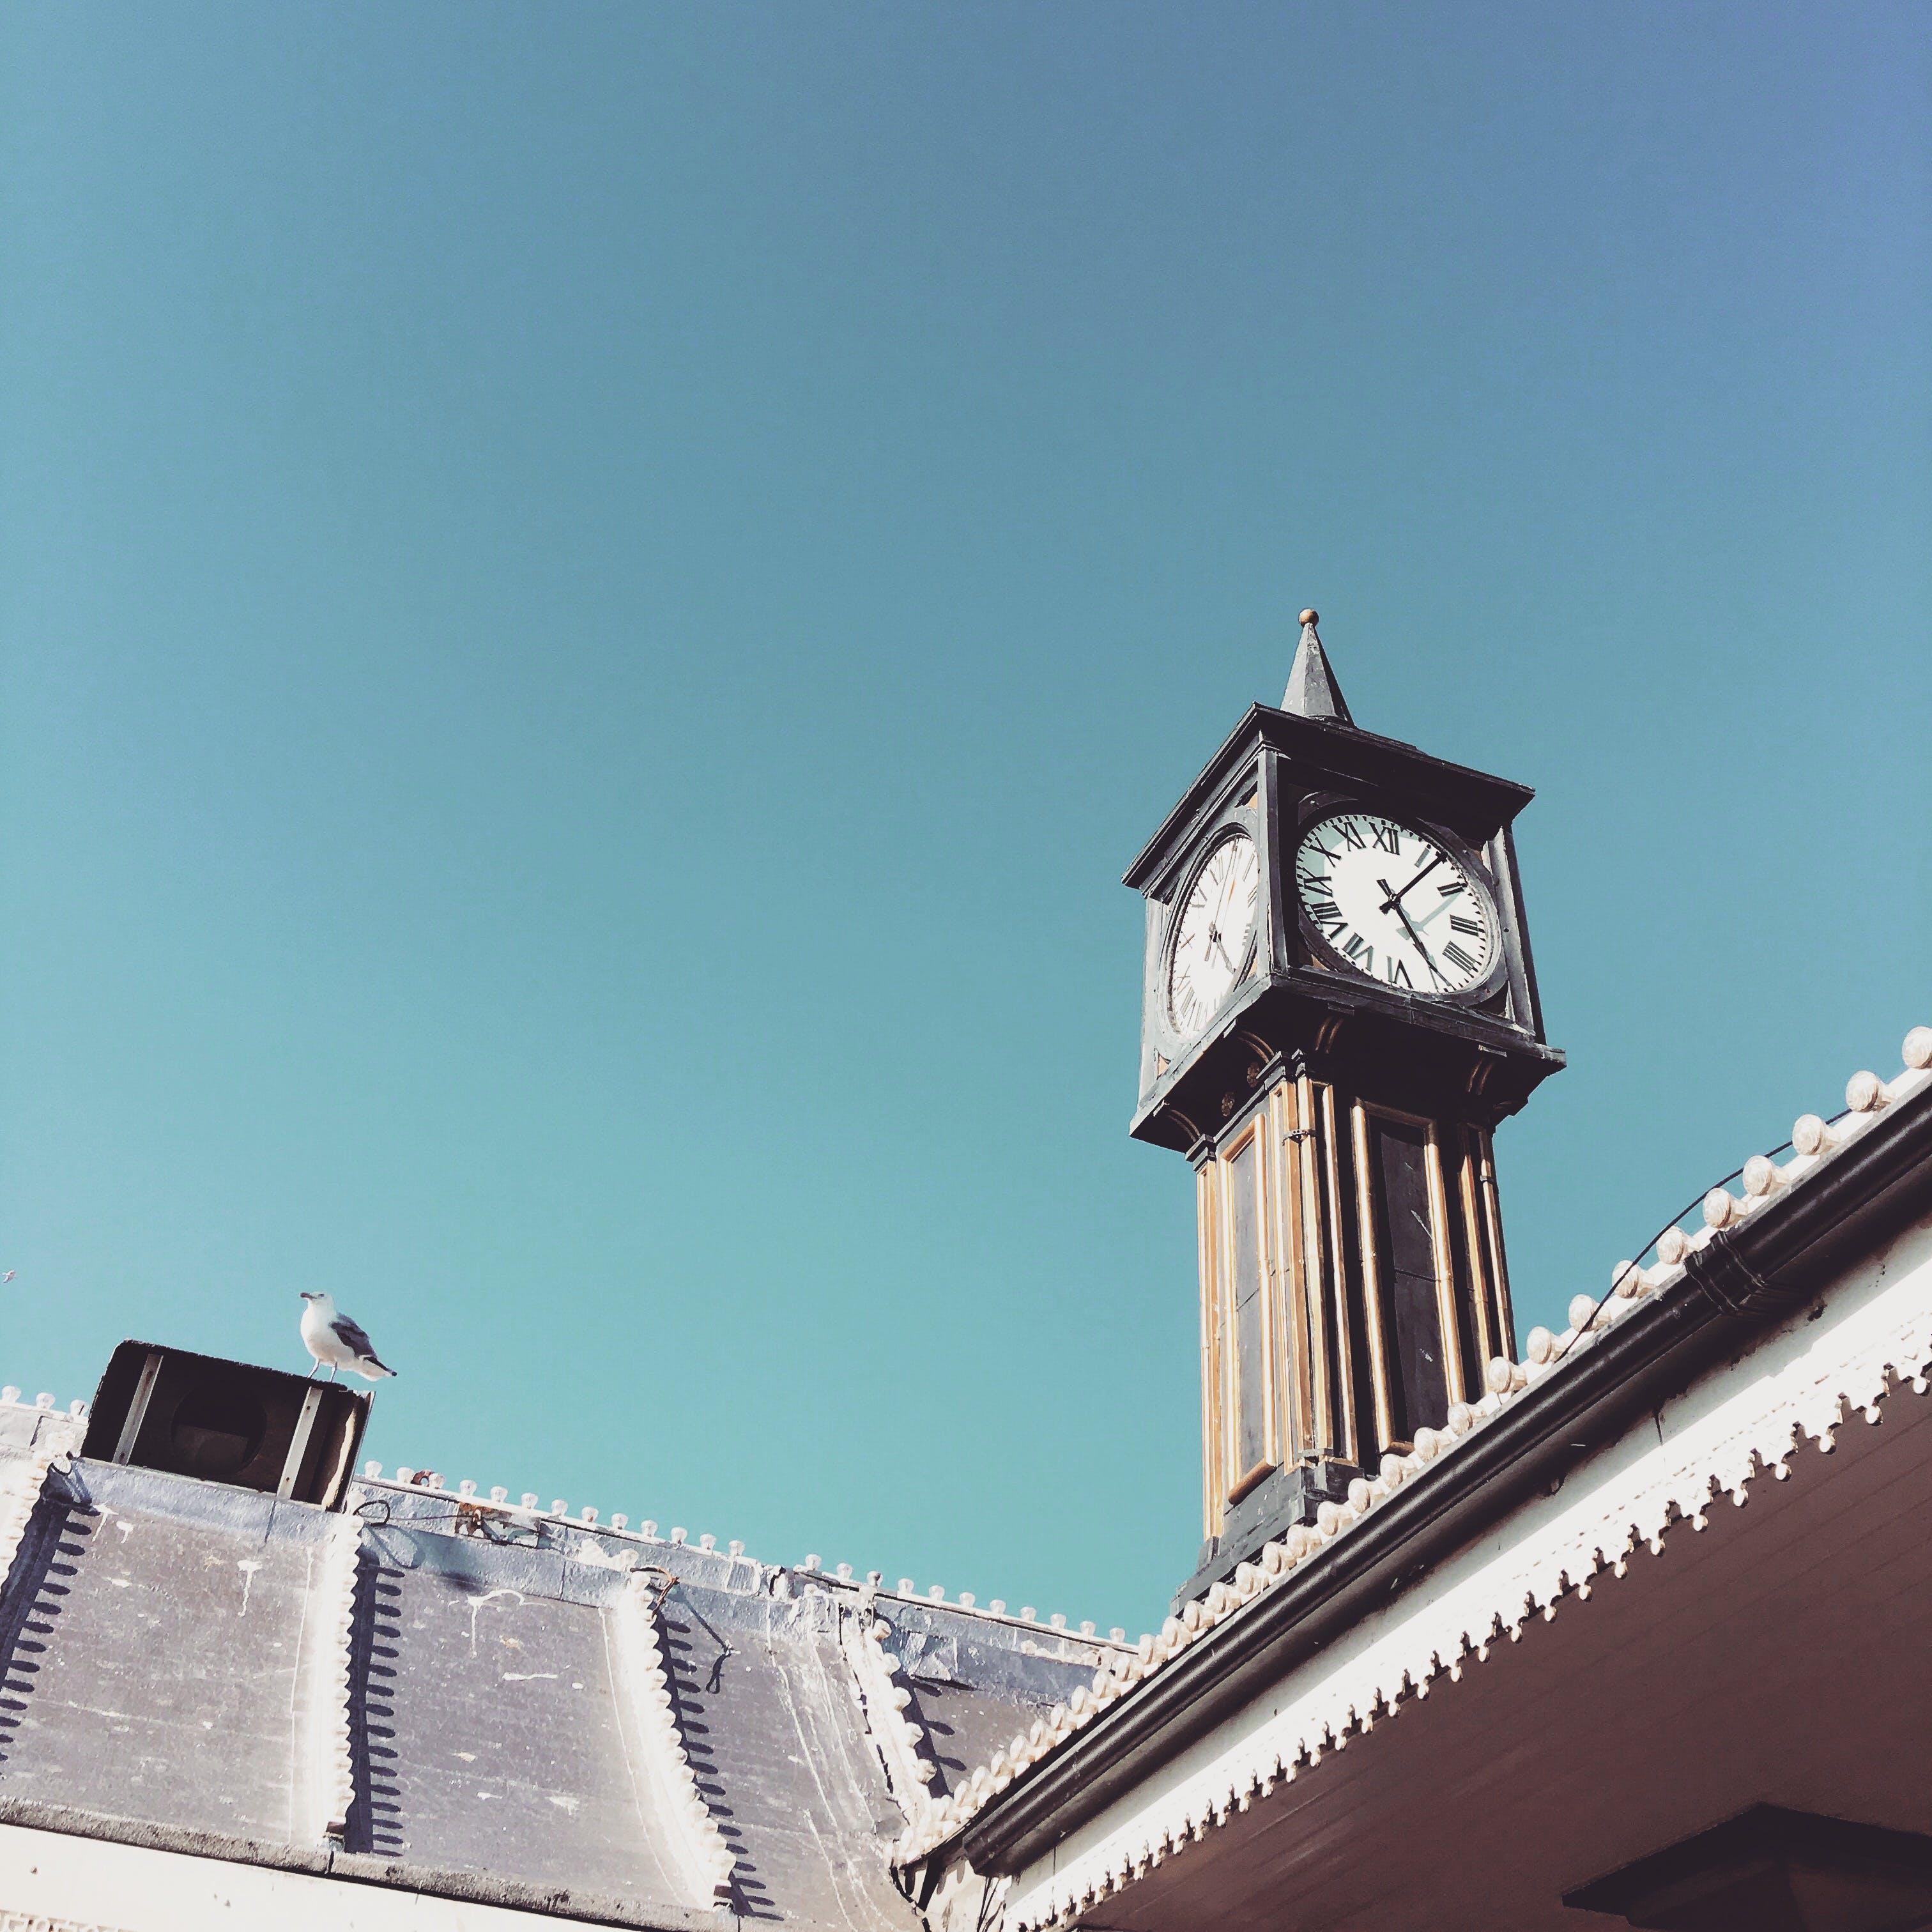 Free stock photo of blue sky, seagulls